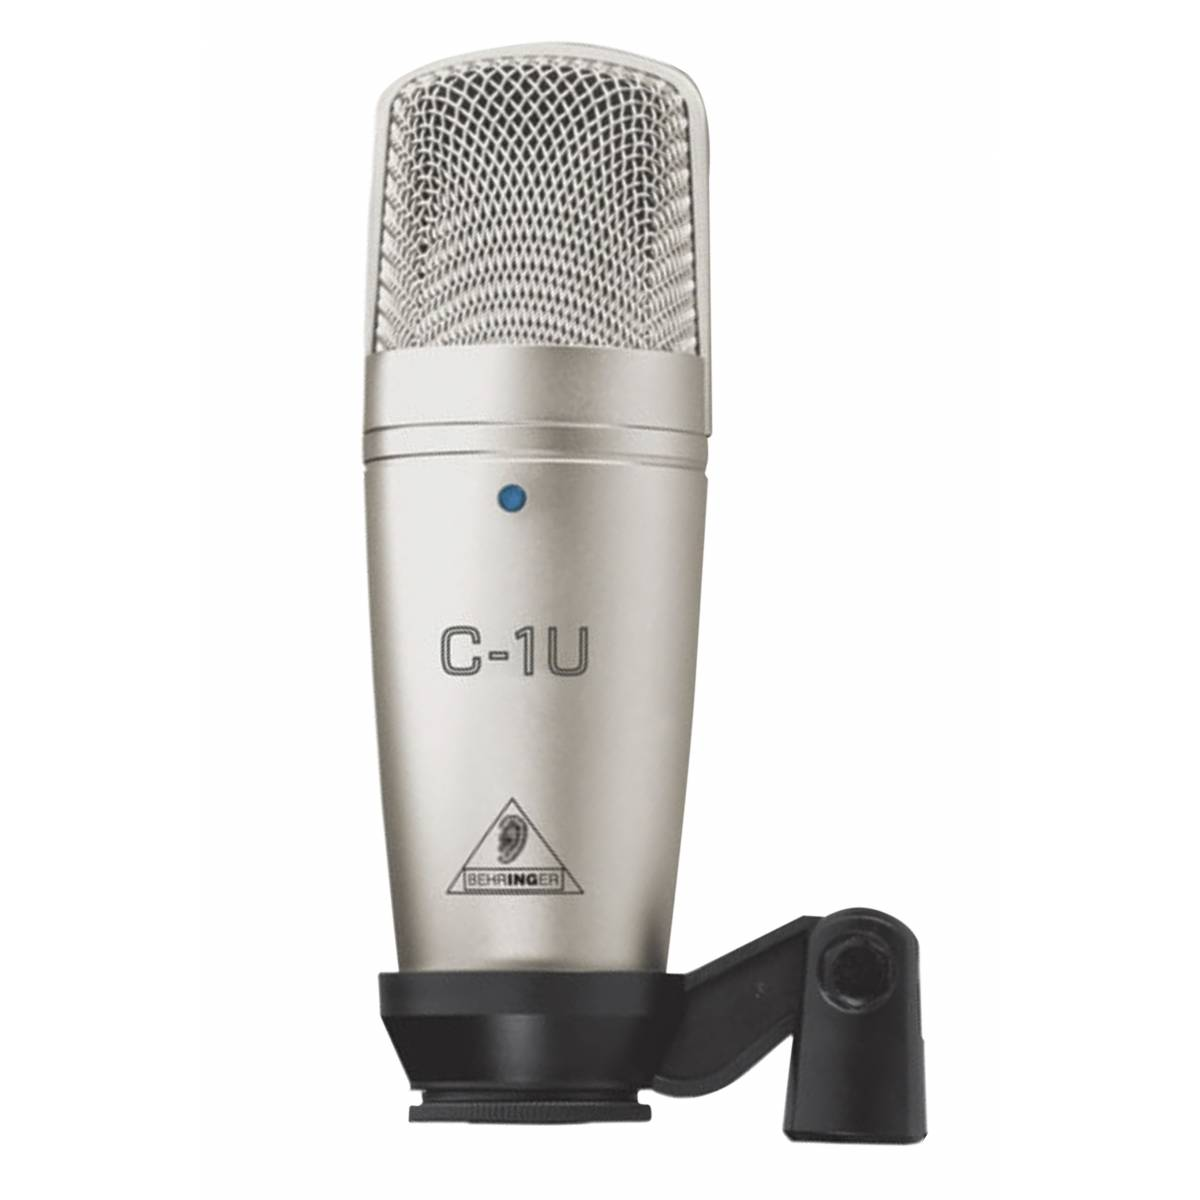 behringer c1u usb studio condenser microphone usb microphones from inta audio uk. Black Bedroom Furniture Sets. Home Design Ideas